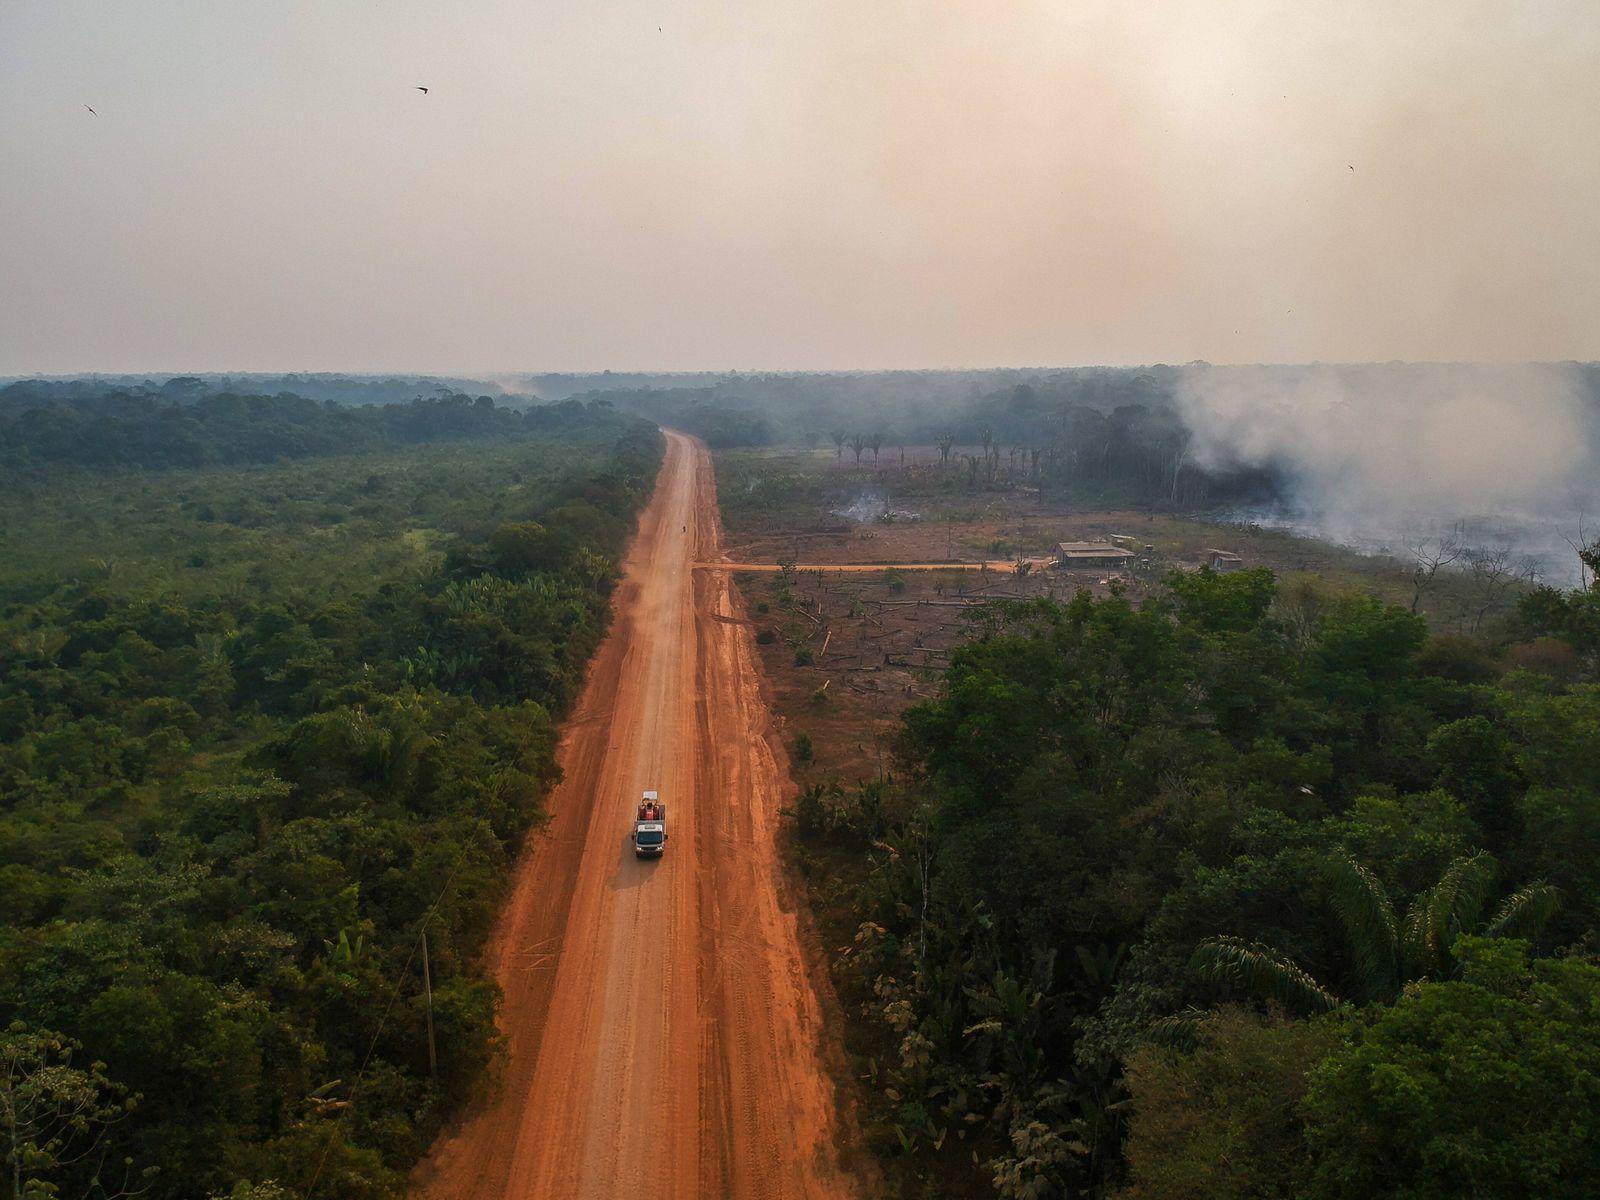 Brasilien, Waldbrände im Amazonasgebiet HUMAITÁ, AM - 12.08.2020: DESMATAMENTO E QUEIMADAS NA BR 230 AM - Deforestation